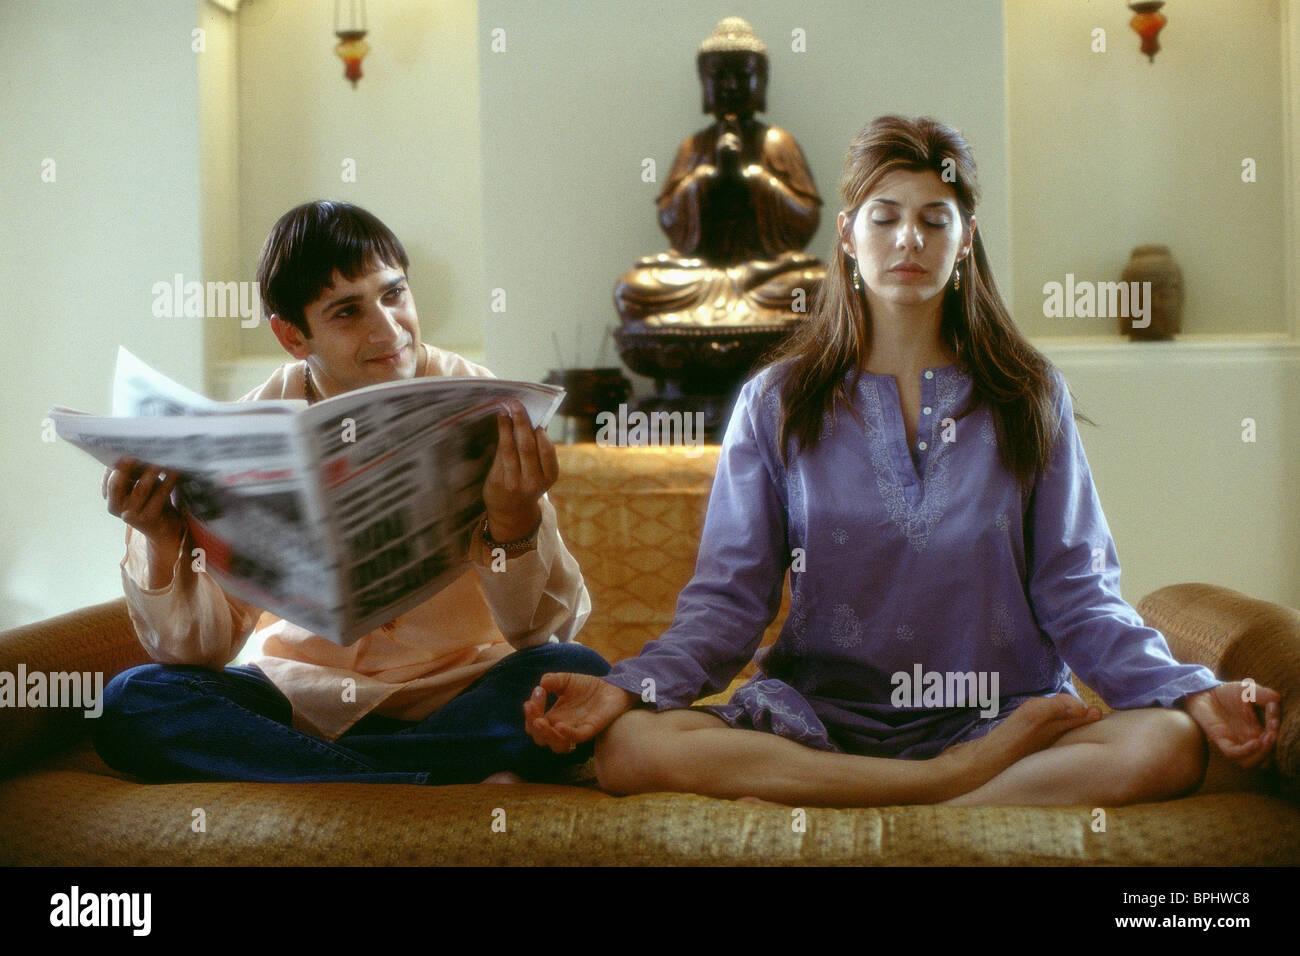 JIMI MISTRY & MARISA TOMEI THE GURU (2002) - Stock Image